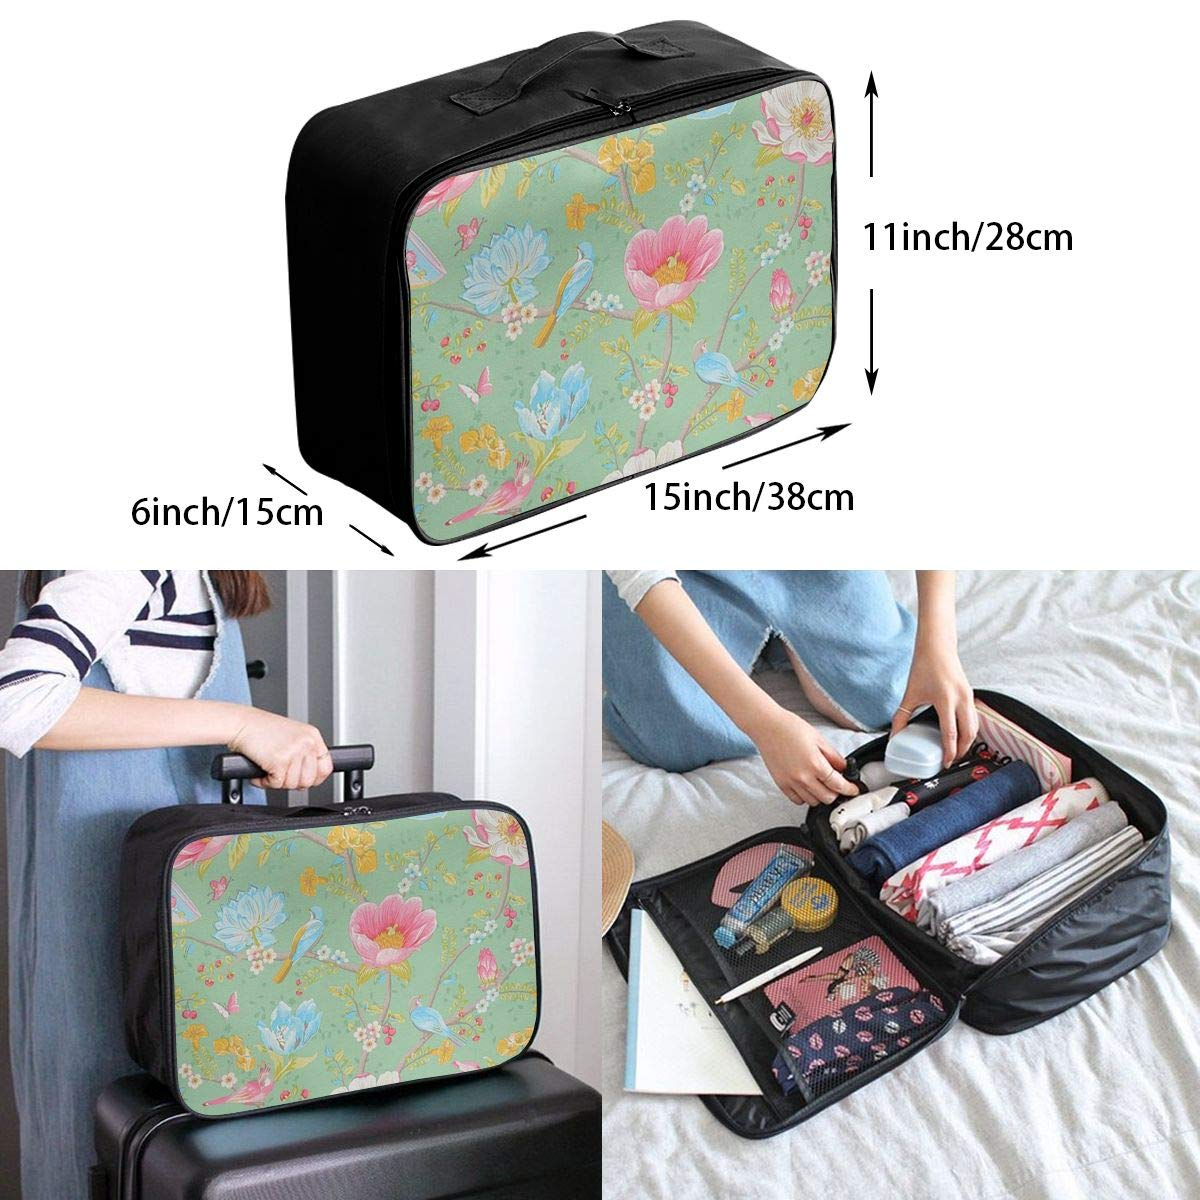 Travel Luggage Duffle Bag Lightweight Portable Handbag Flower Pattern Large Capacity Waterproof Foldable Storage Tote